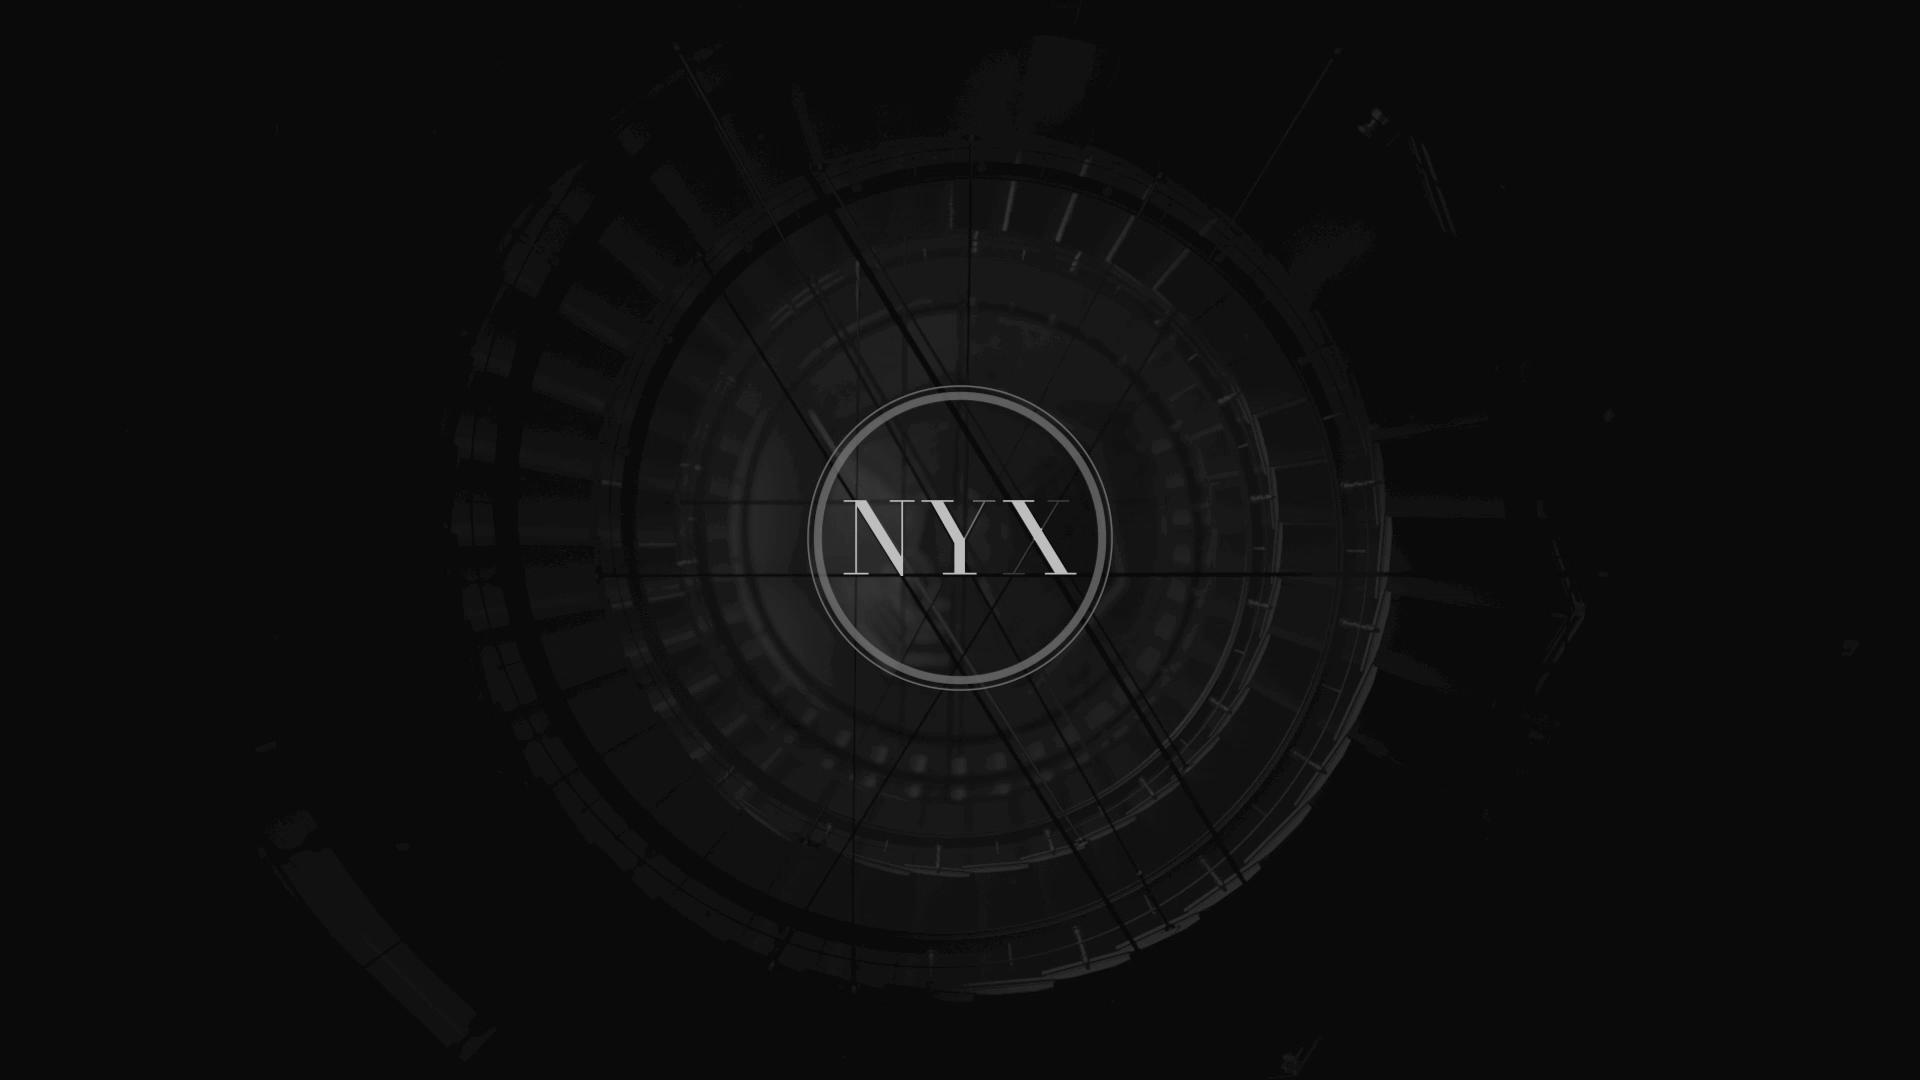 nyx transition title design motion 3D logo anamorphosis branding